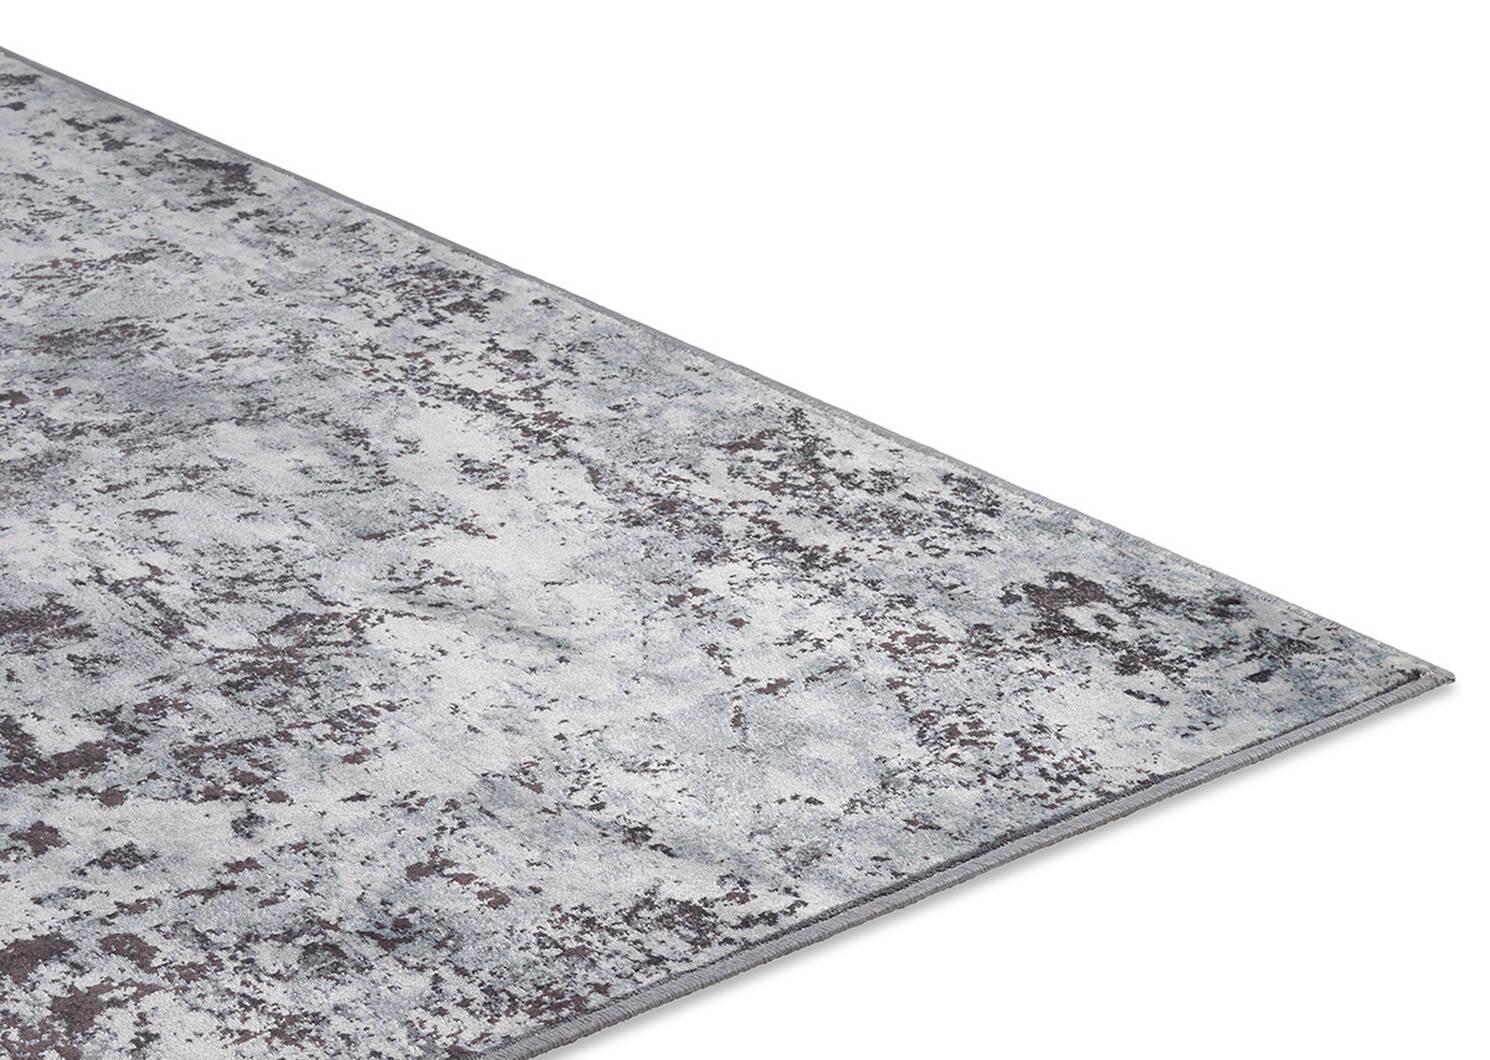 Lariviere Rug 79x118 Grey/Charcoal